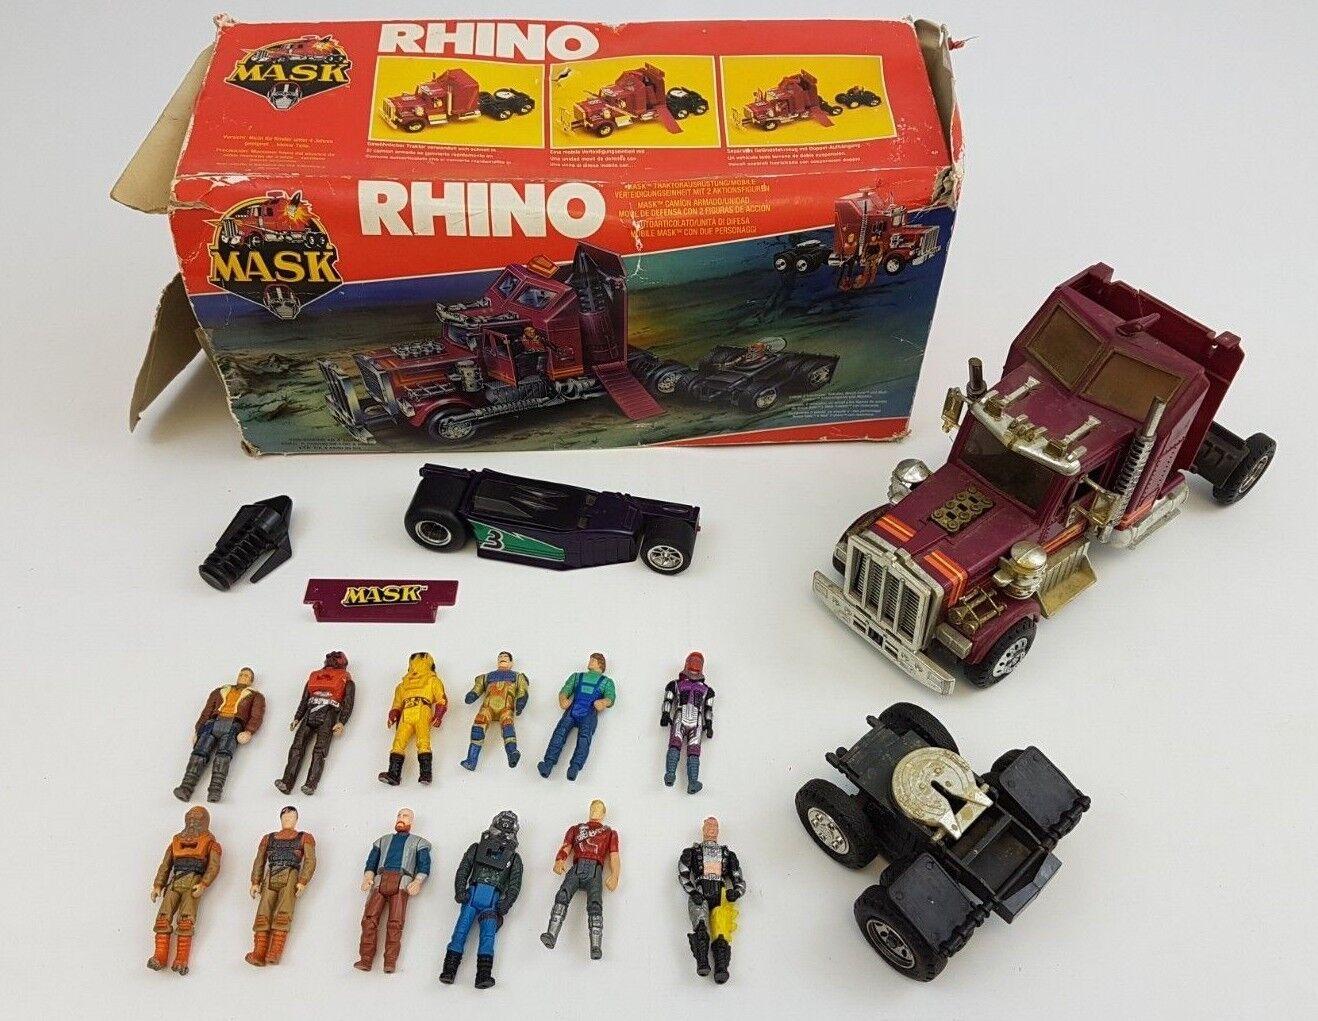 Rhino M.A.S.K MATT TRAKKER Camion Trattore Rig DIFESA unità KENNER MASK IN SCATOLA BOX